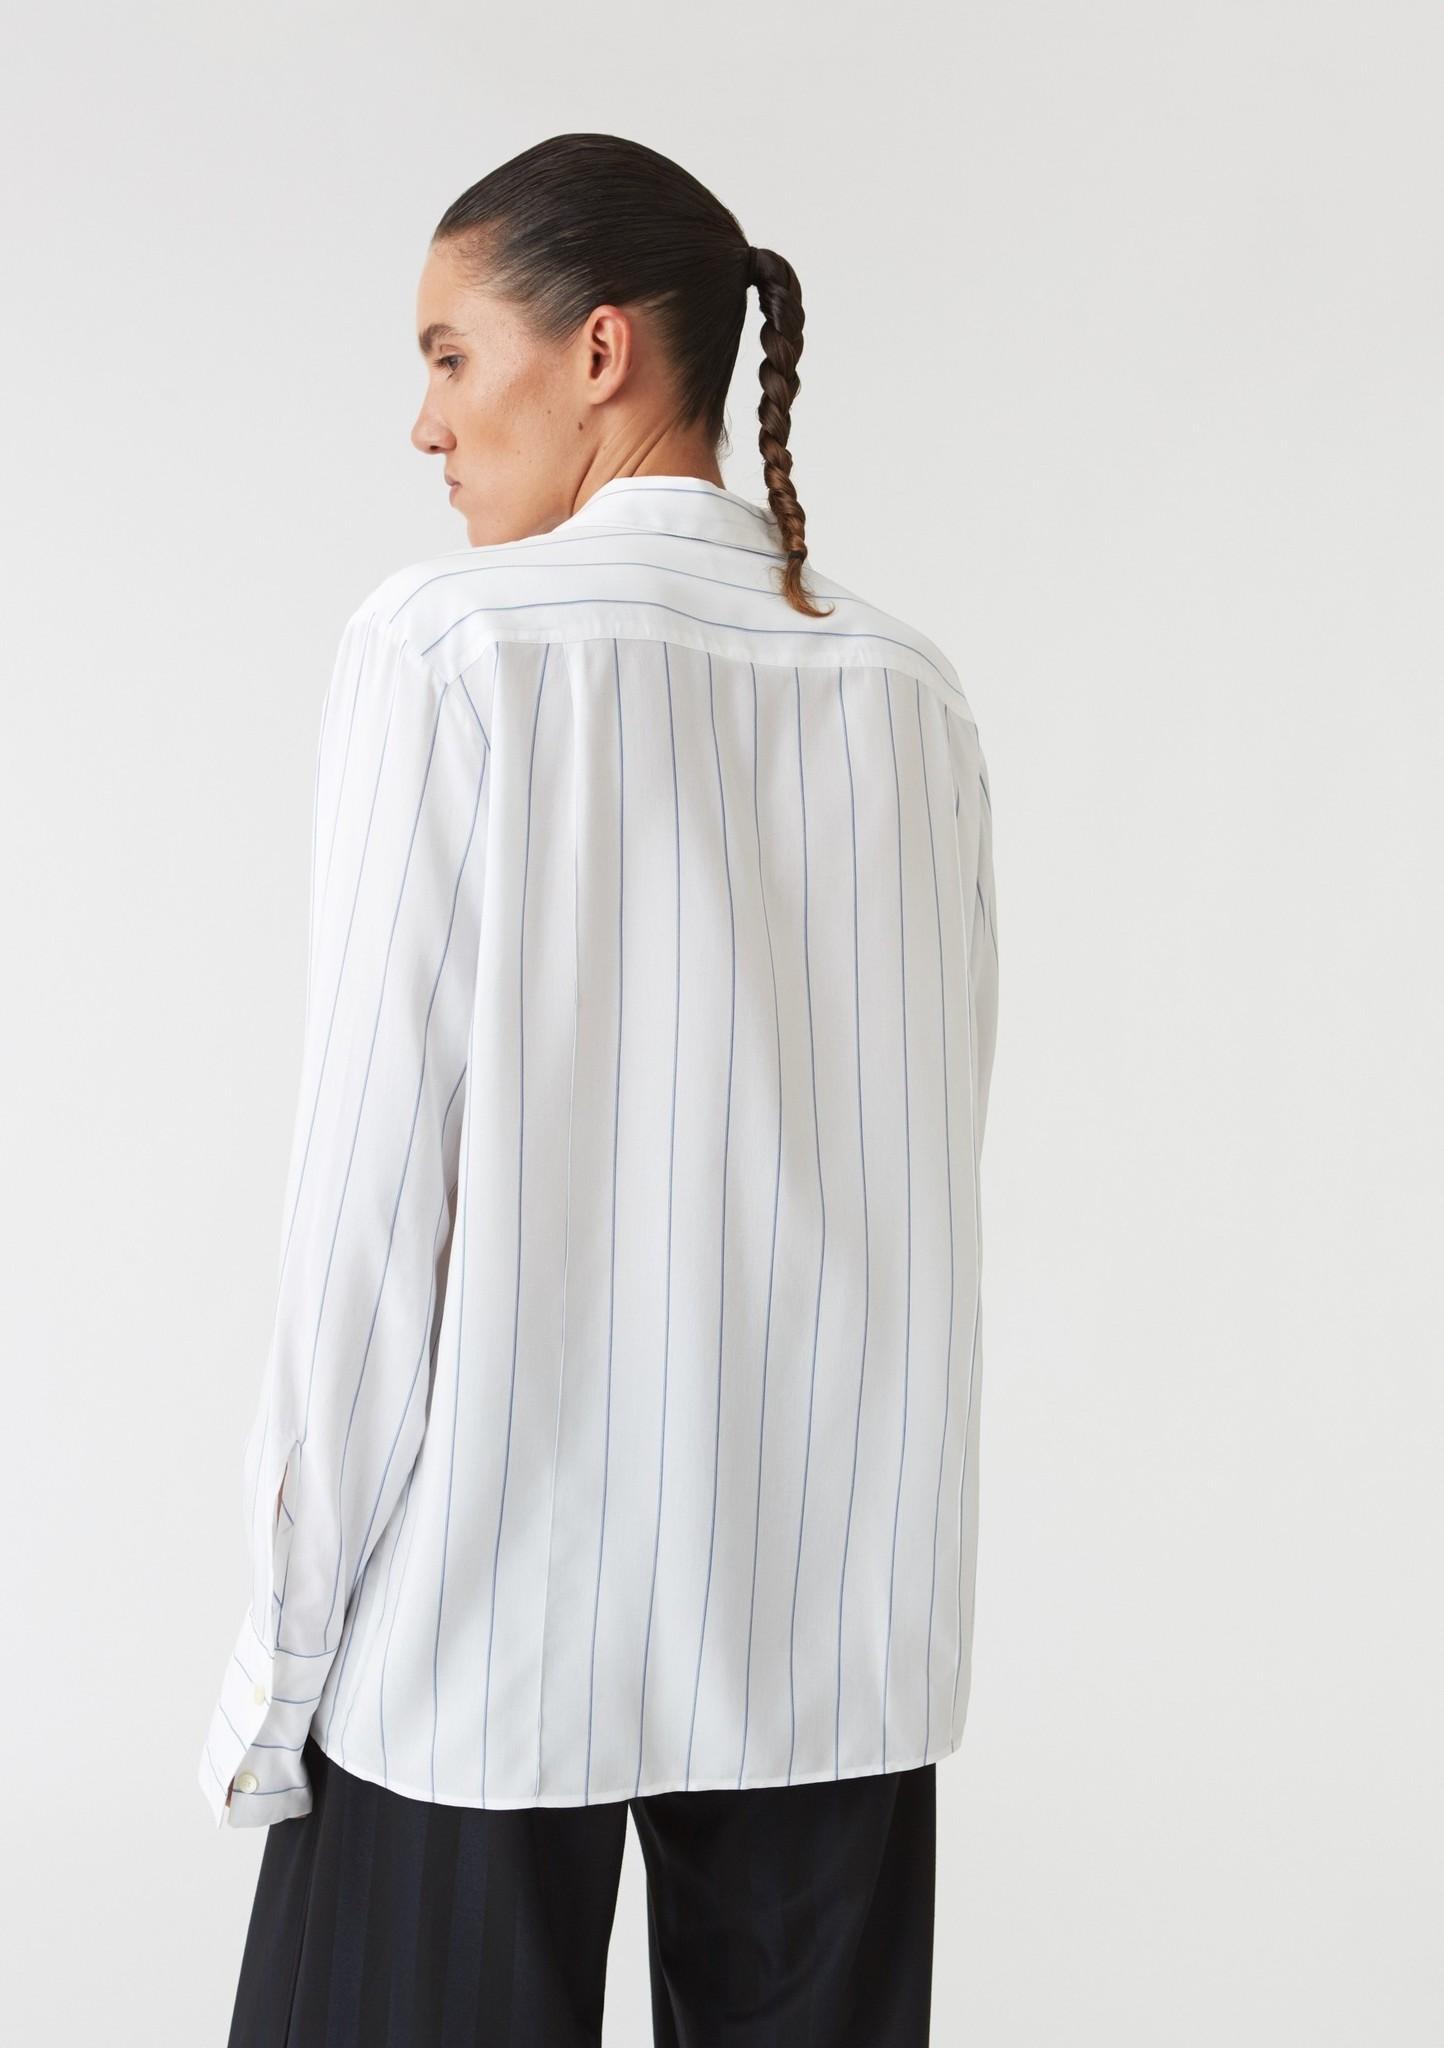 Crease shirt Blue stripe